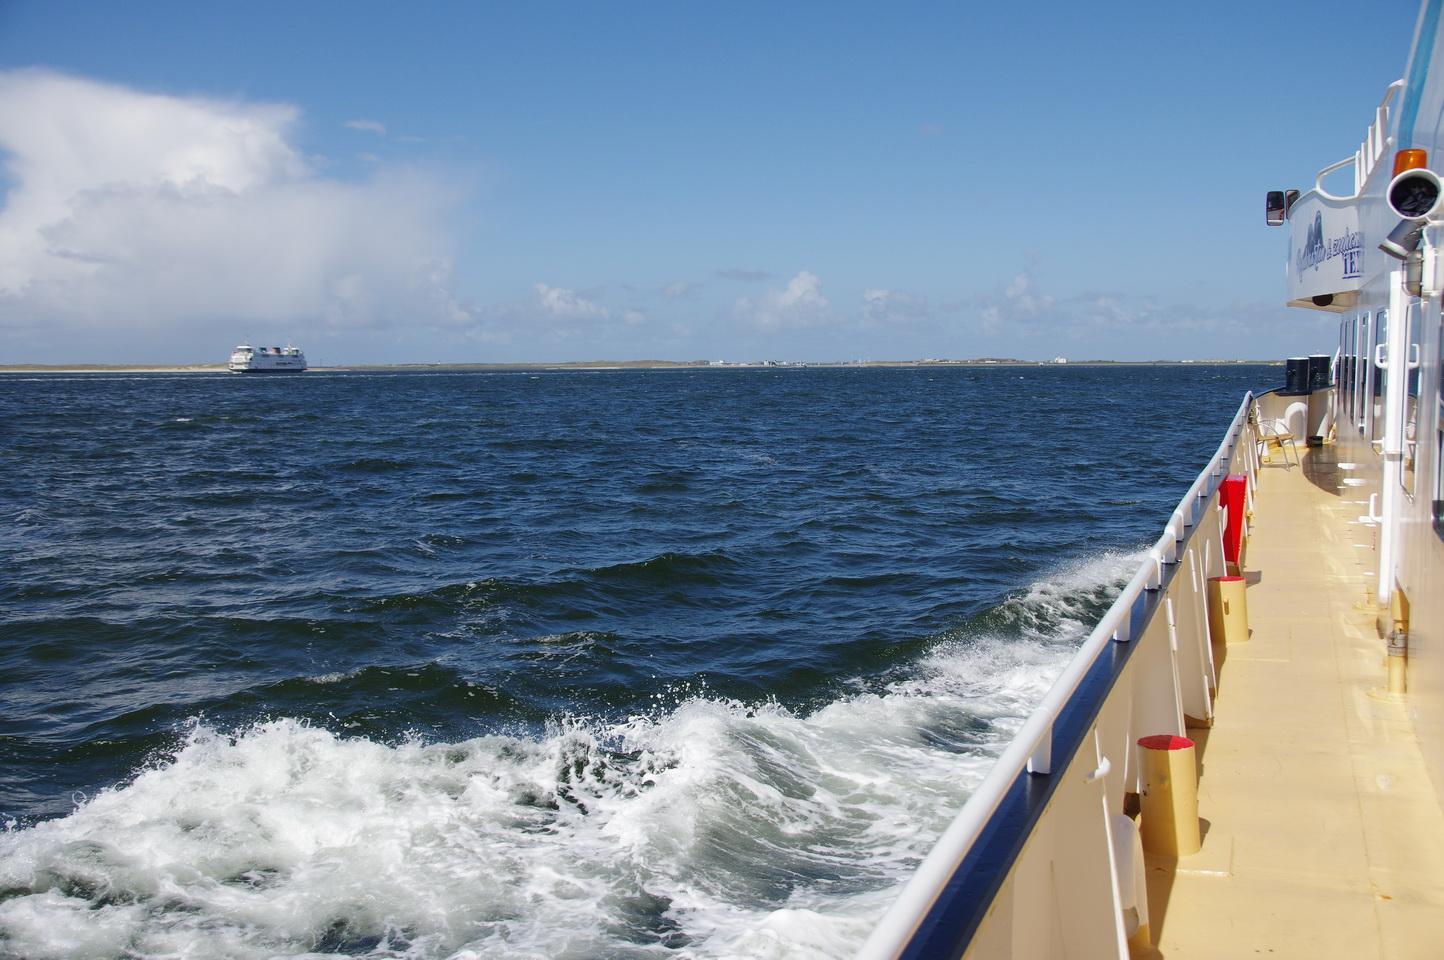 Texel - Schifffahrt Texel 44 TH 16